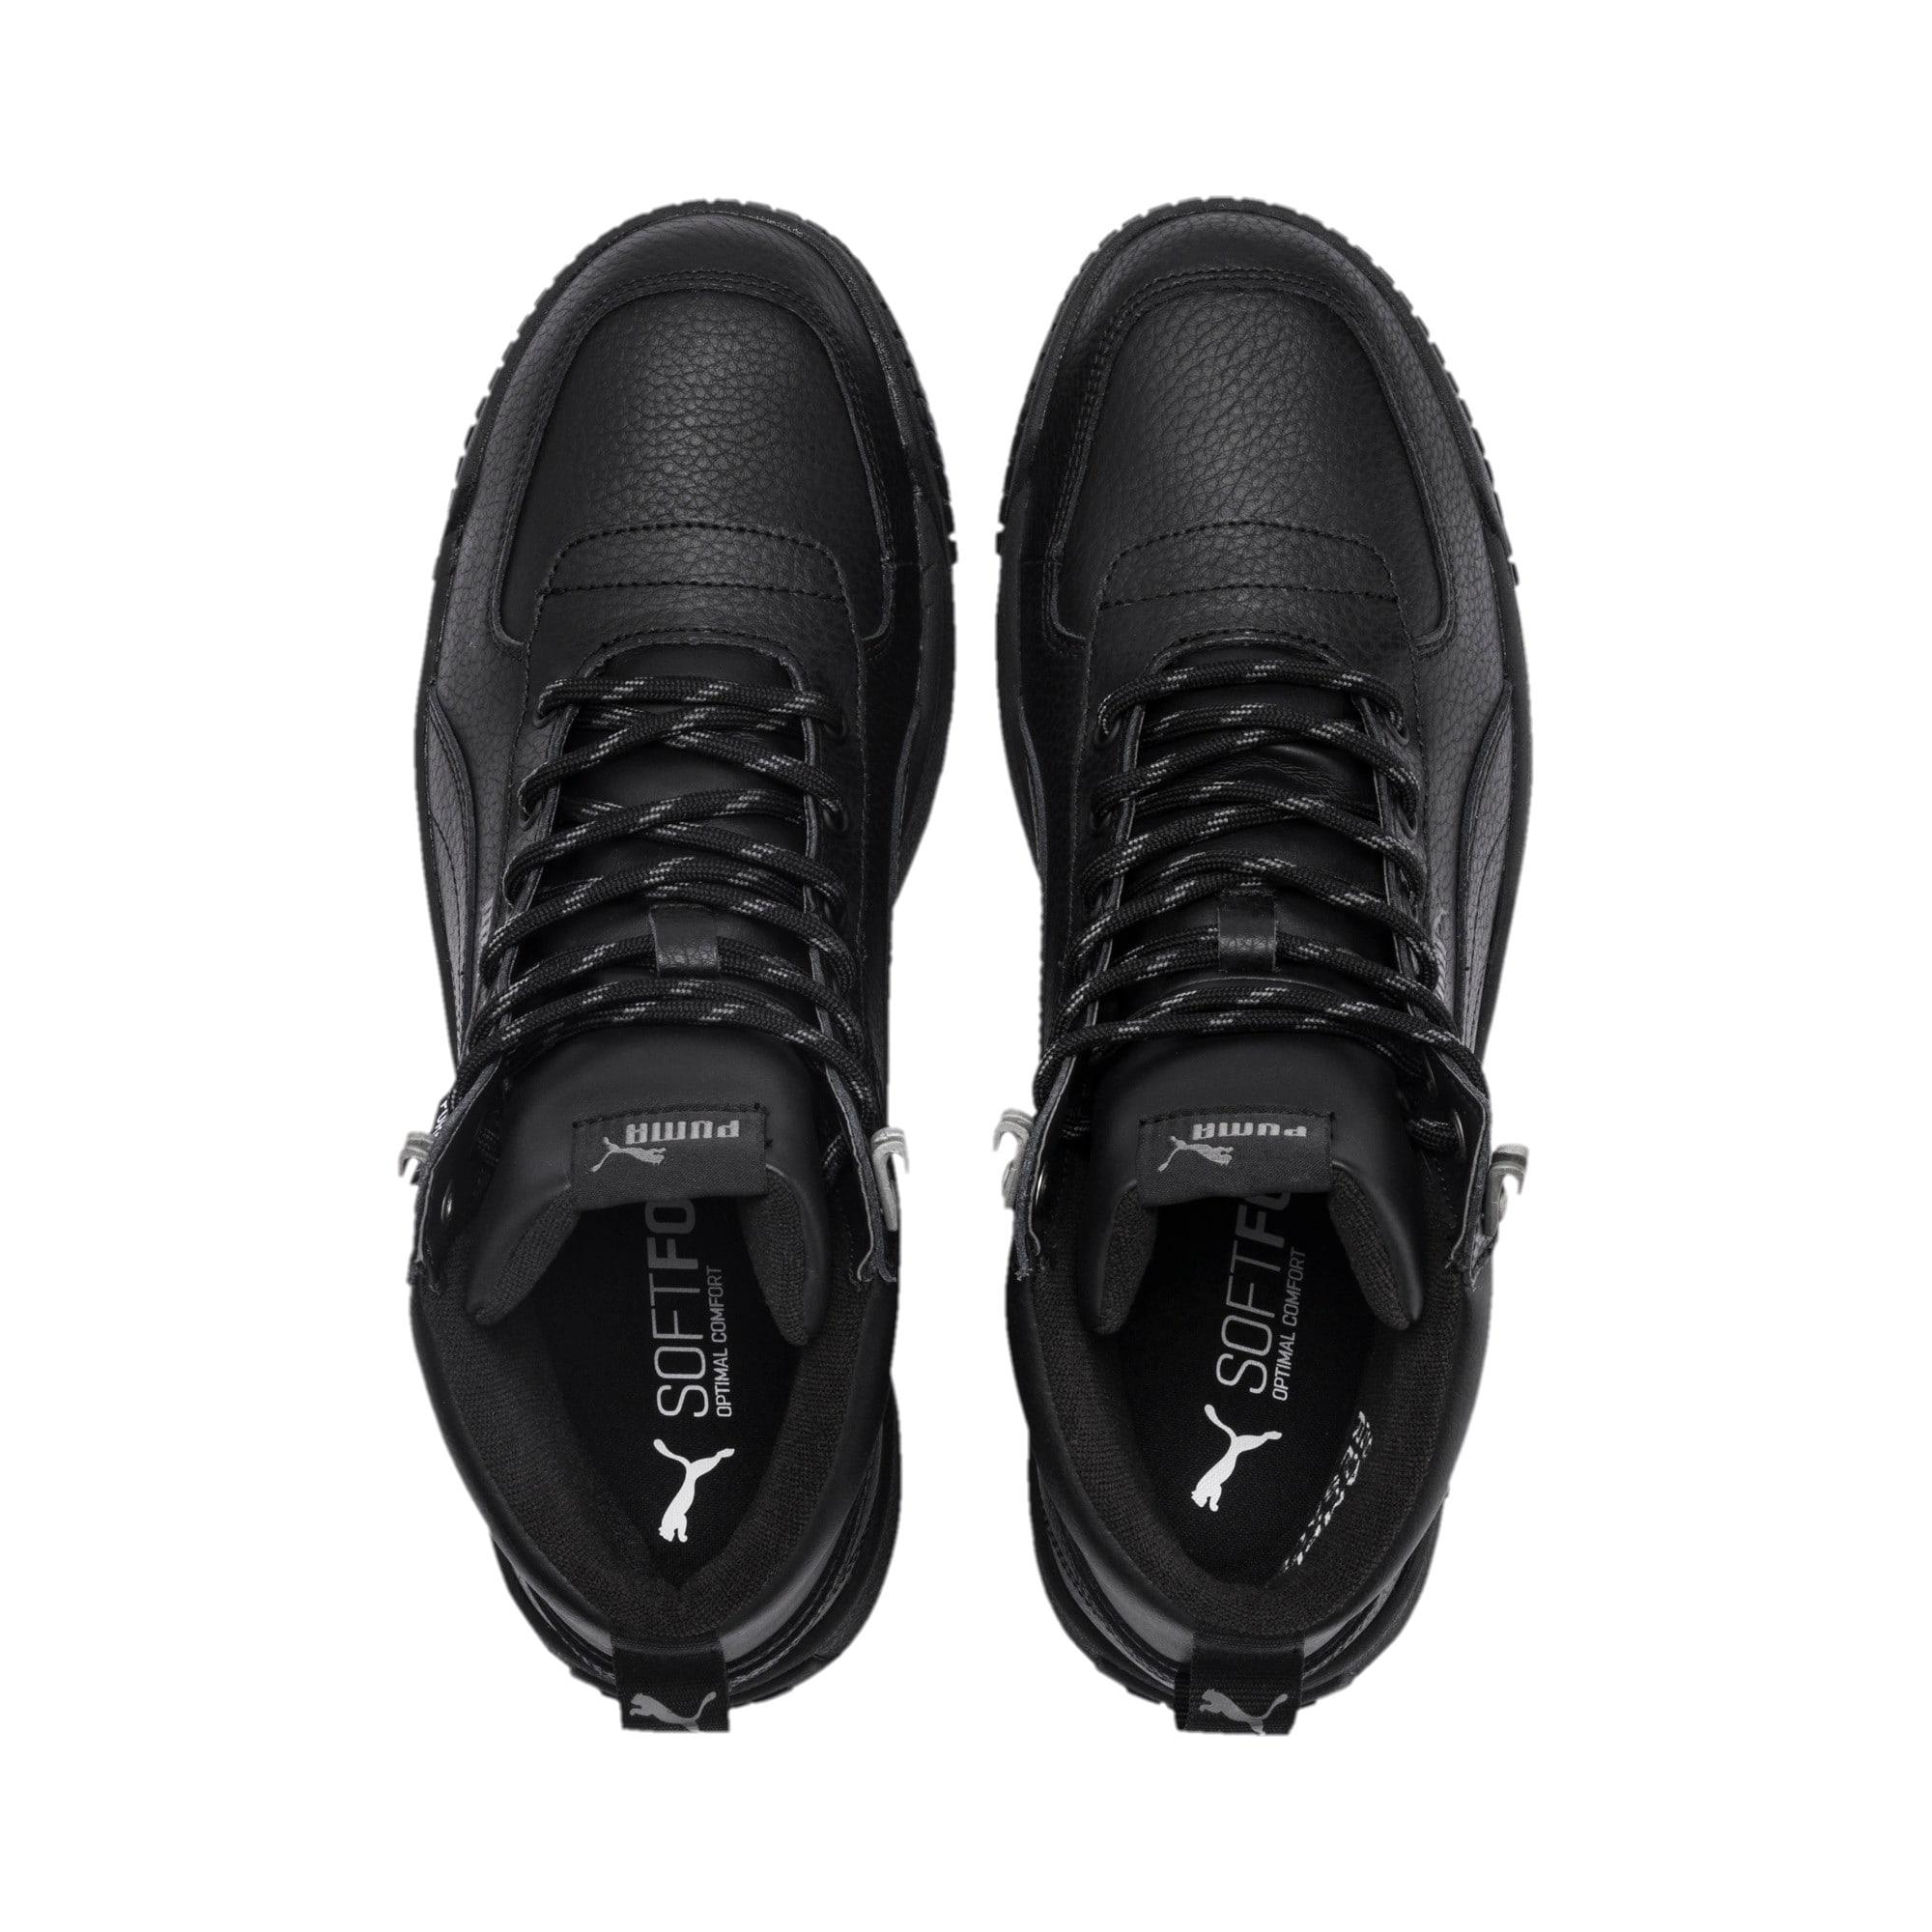 Thumbnail 7 of Tarrenz SB PURETEX Mid Sneakers, Puma Black-Puma Black, medium